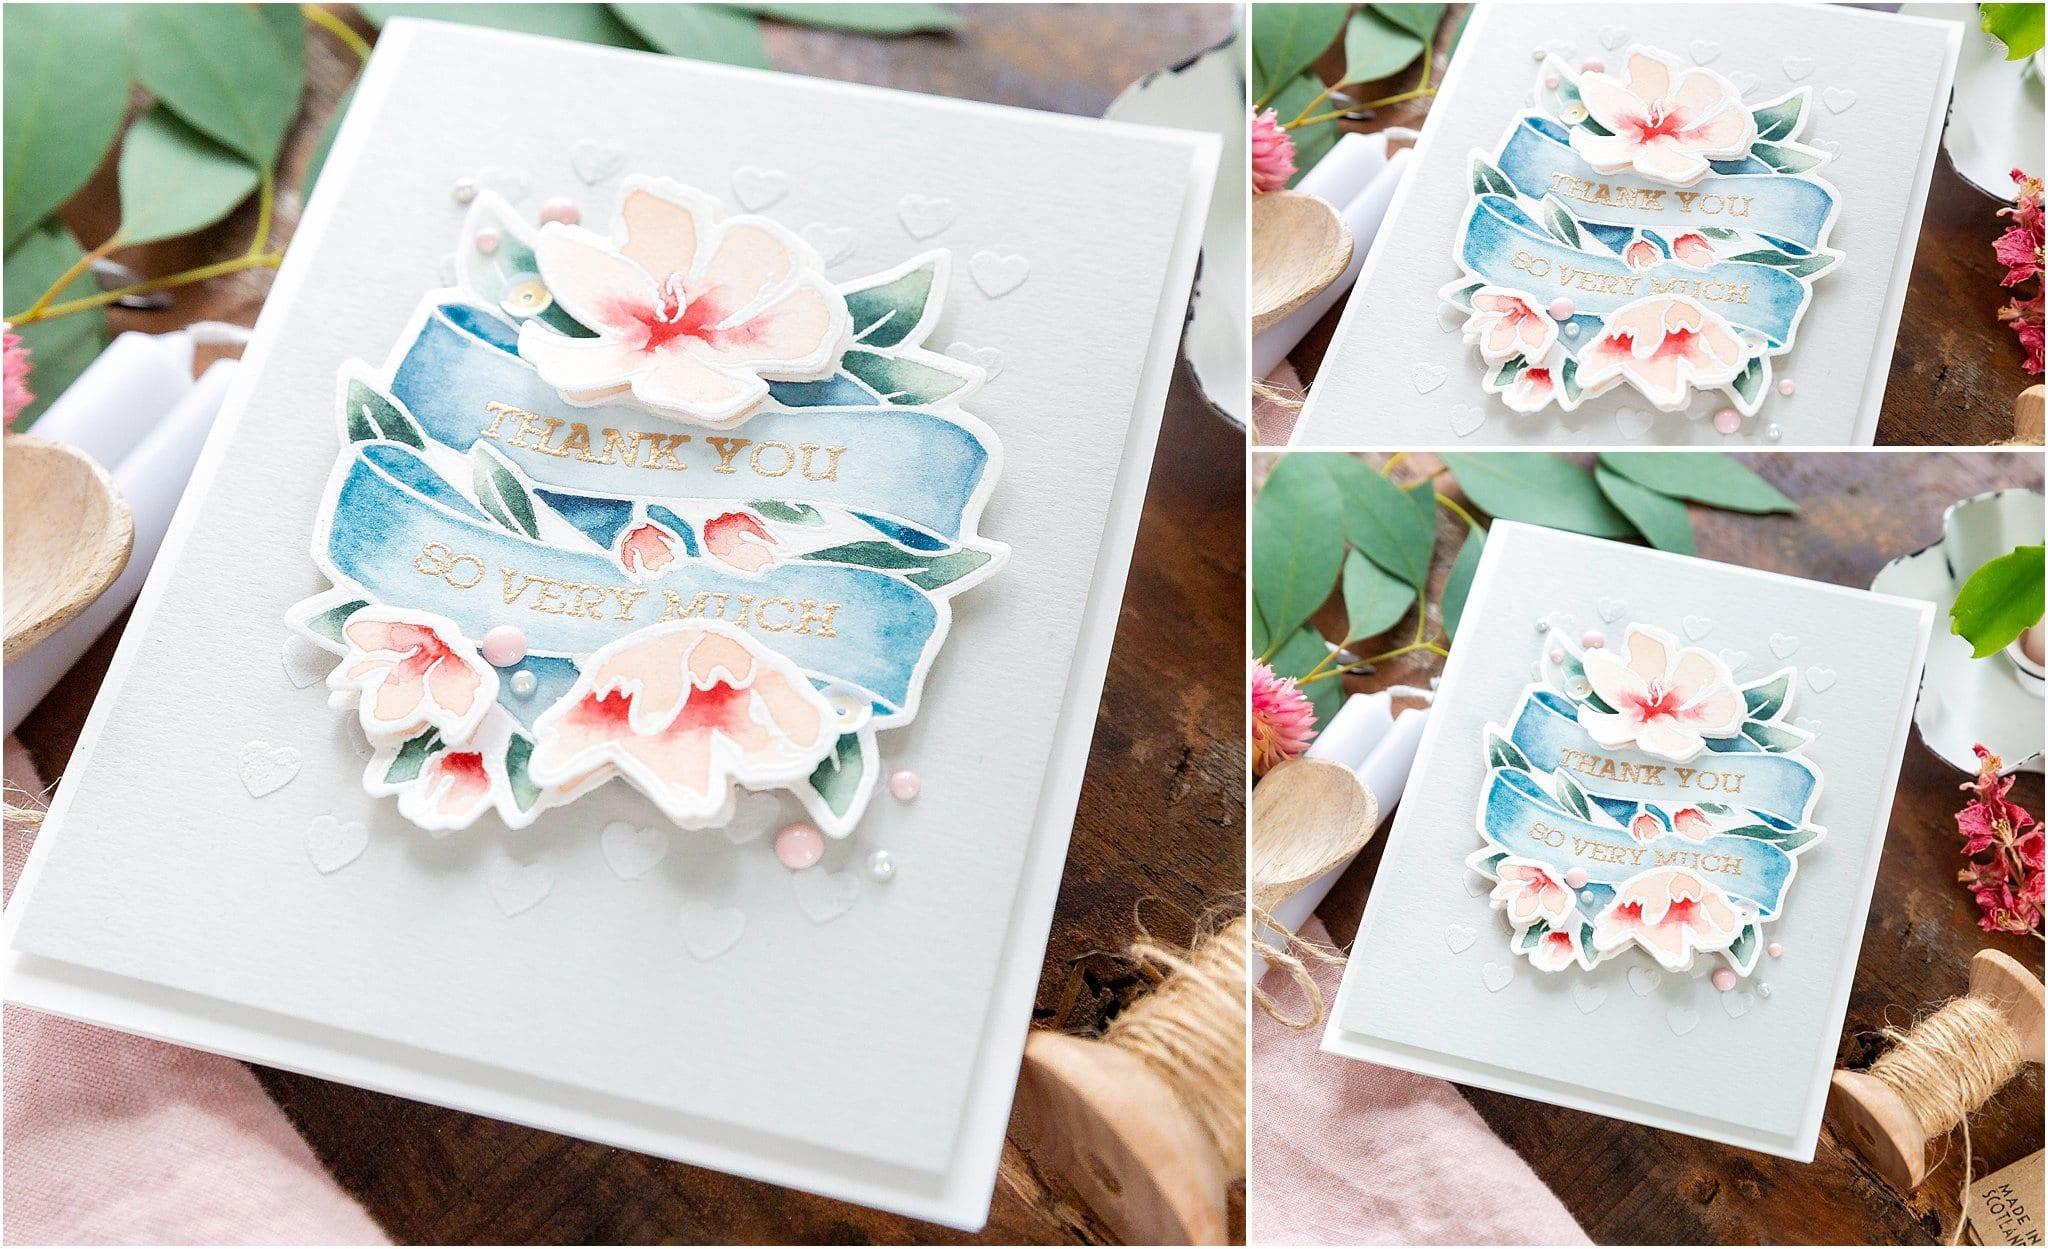 Video tutorial - watercoloured floral banner handmade card by Debby Hughes using supplies from Simon Says Stamp #handmadecards #cardmaking #cardmakingideas #cardmakingtechniques  #cardmakingtutorials #handmadecardideas #simonsaysstamp